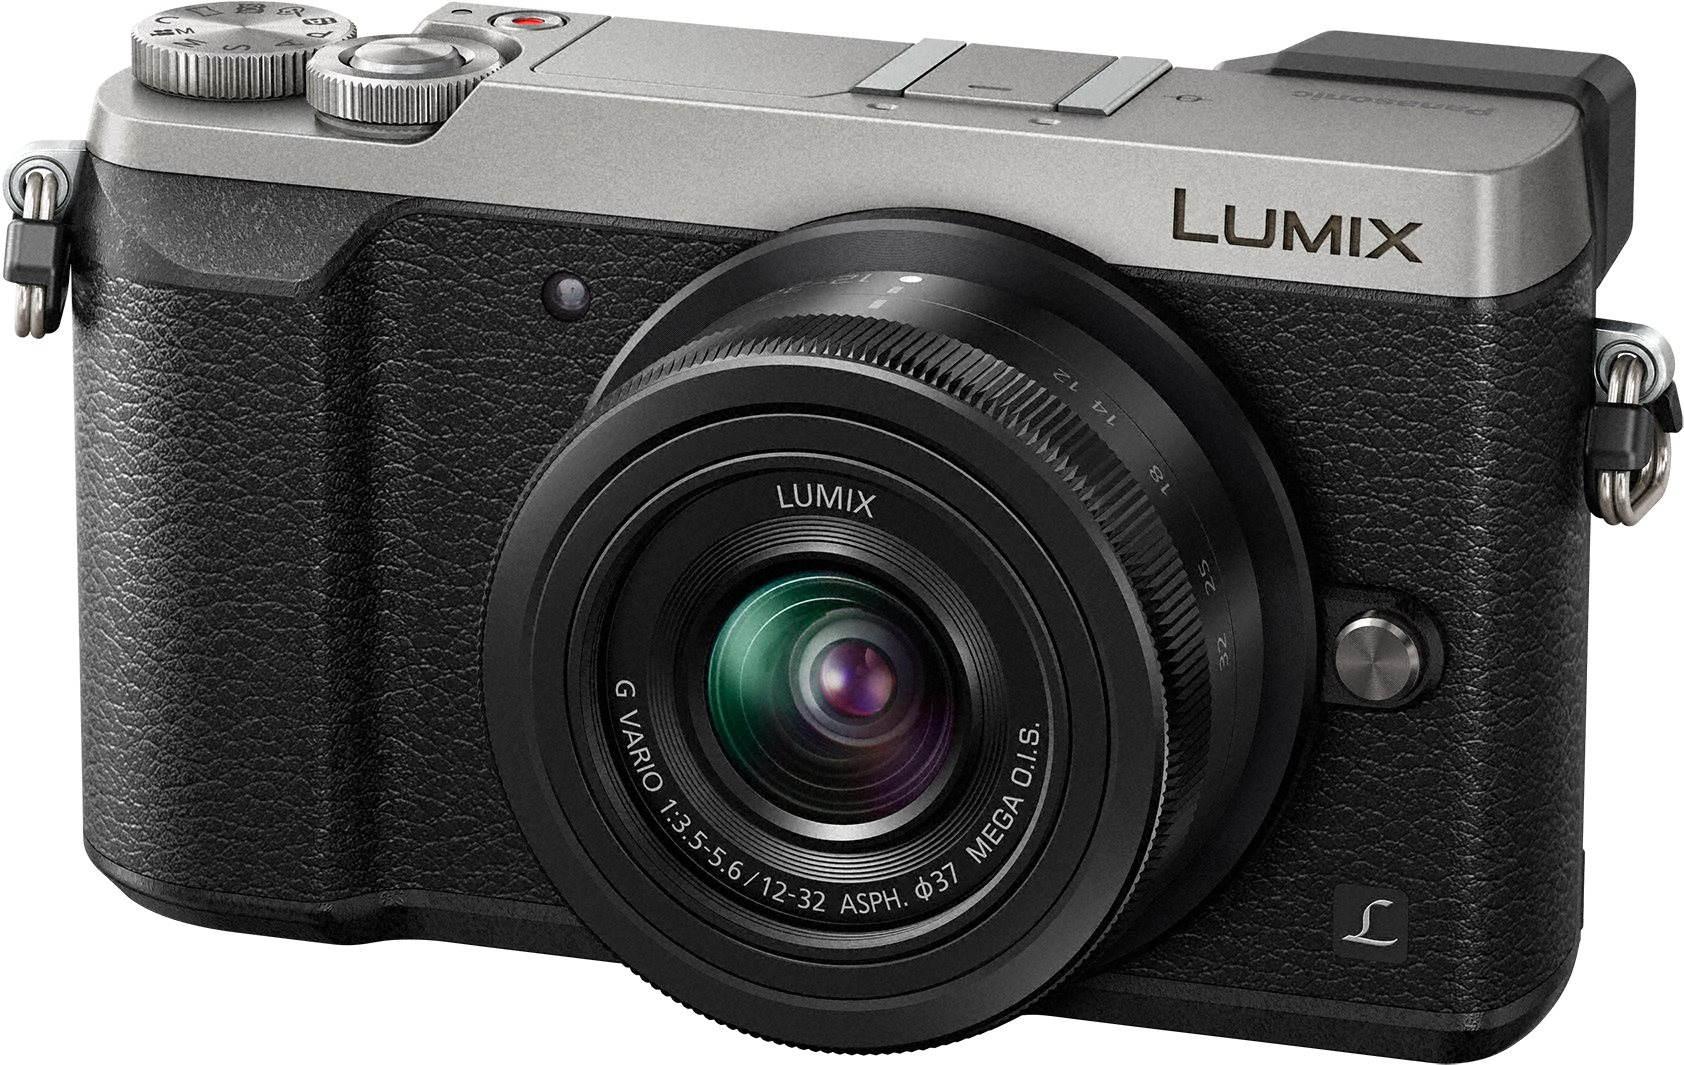 Digitální fotoaparát Panasonic LUMIX DMC-GX80 stříbrný + objektiv 12-32mm